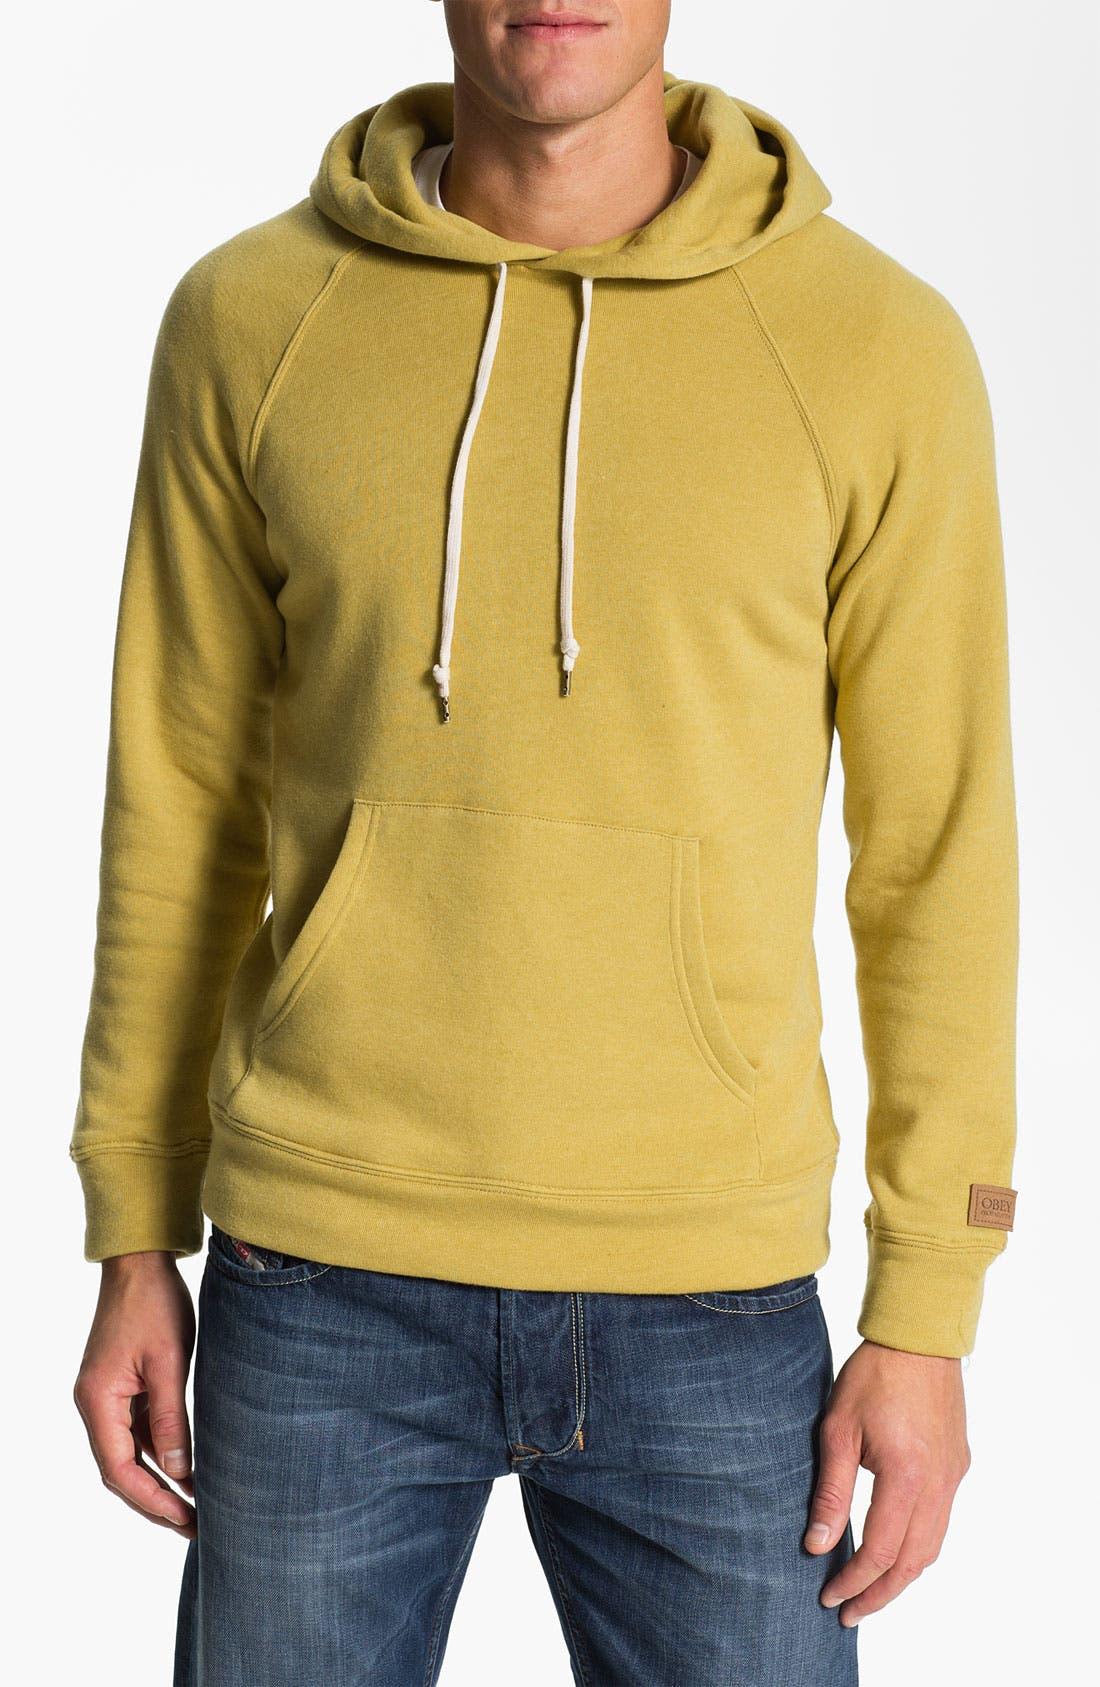 Alternate Image 1 Selected - Obey 'Lofty Creature Comforts' Hooded Sweatshirt